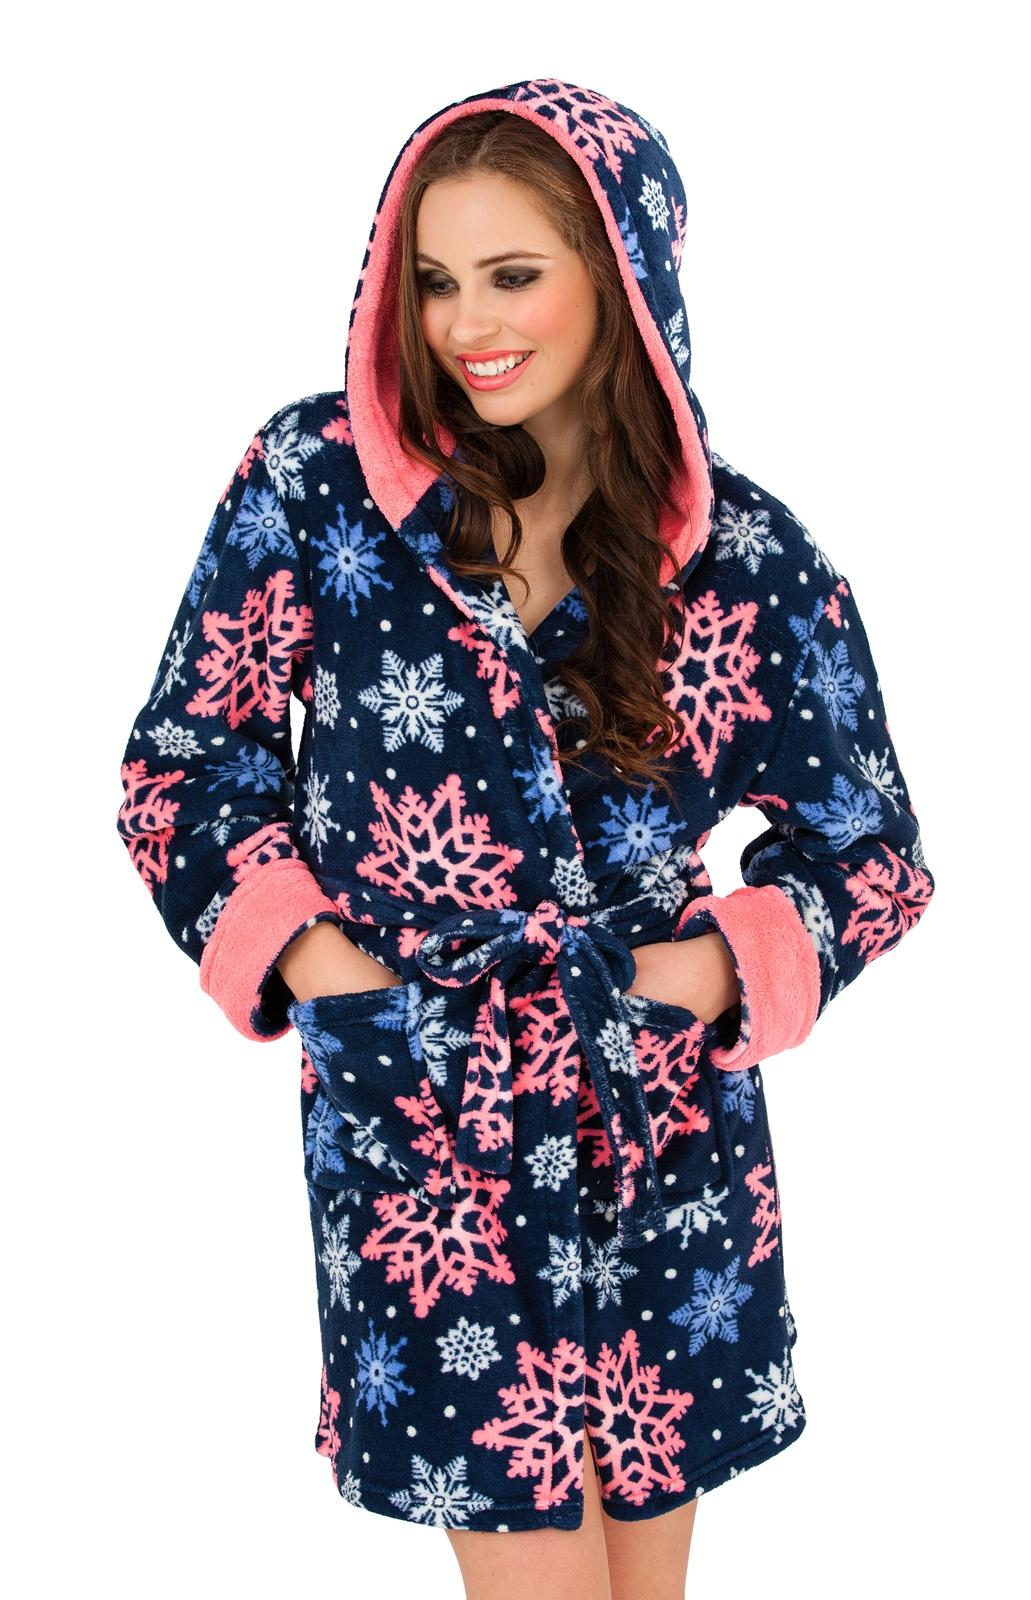 womens short hooded dressing gown bath robe housecoat. Black Bedroom Furniture Sets. Home Design Ideas